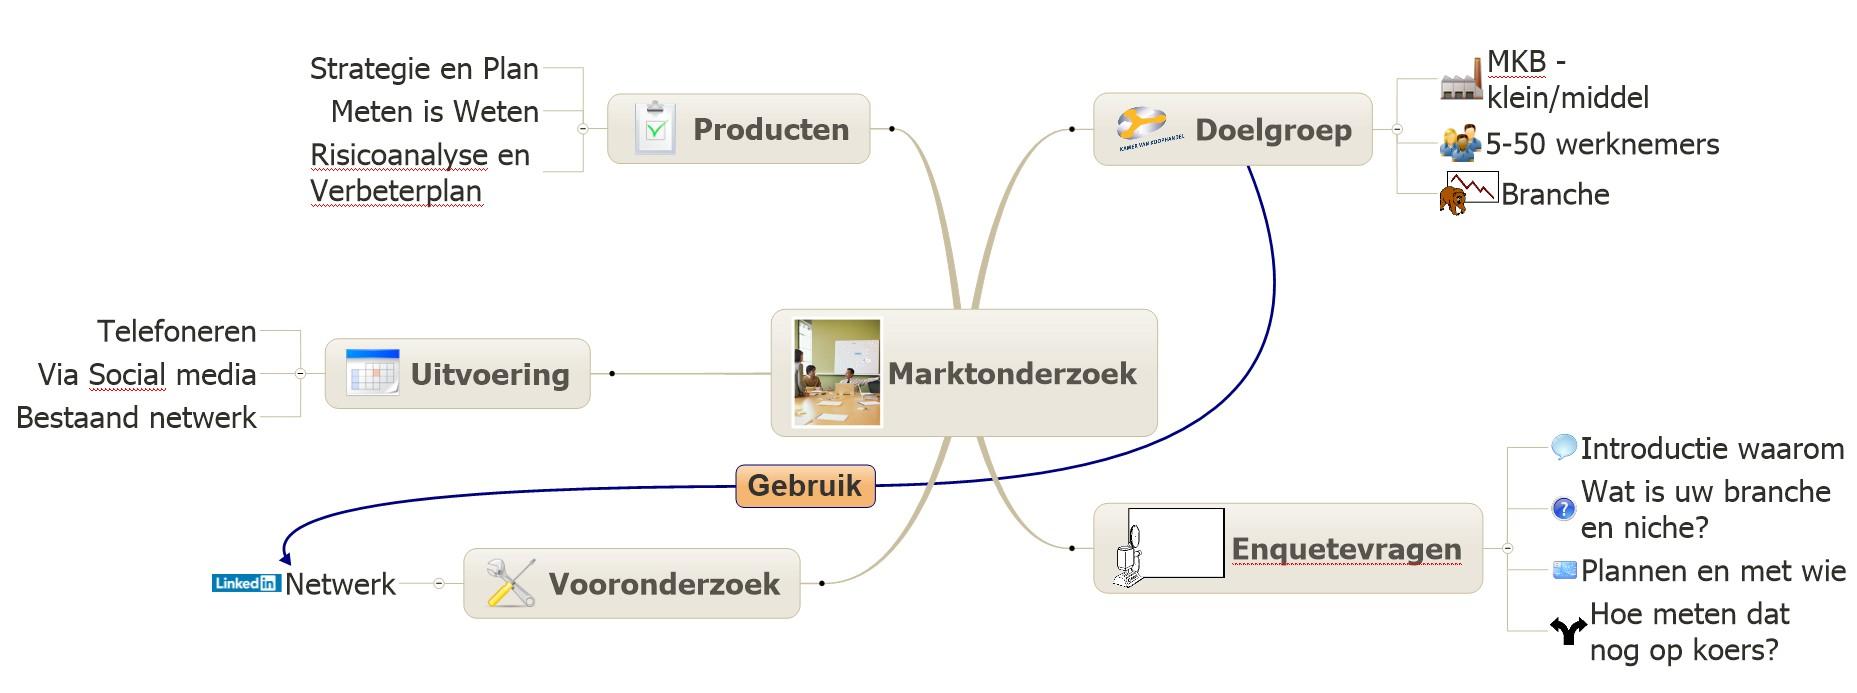 Visualincrease marktonderzoek Mindmap